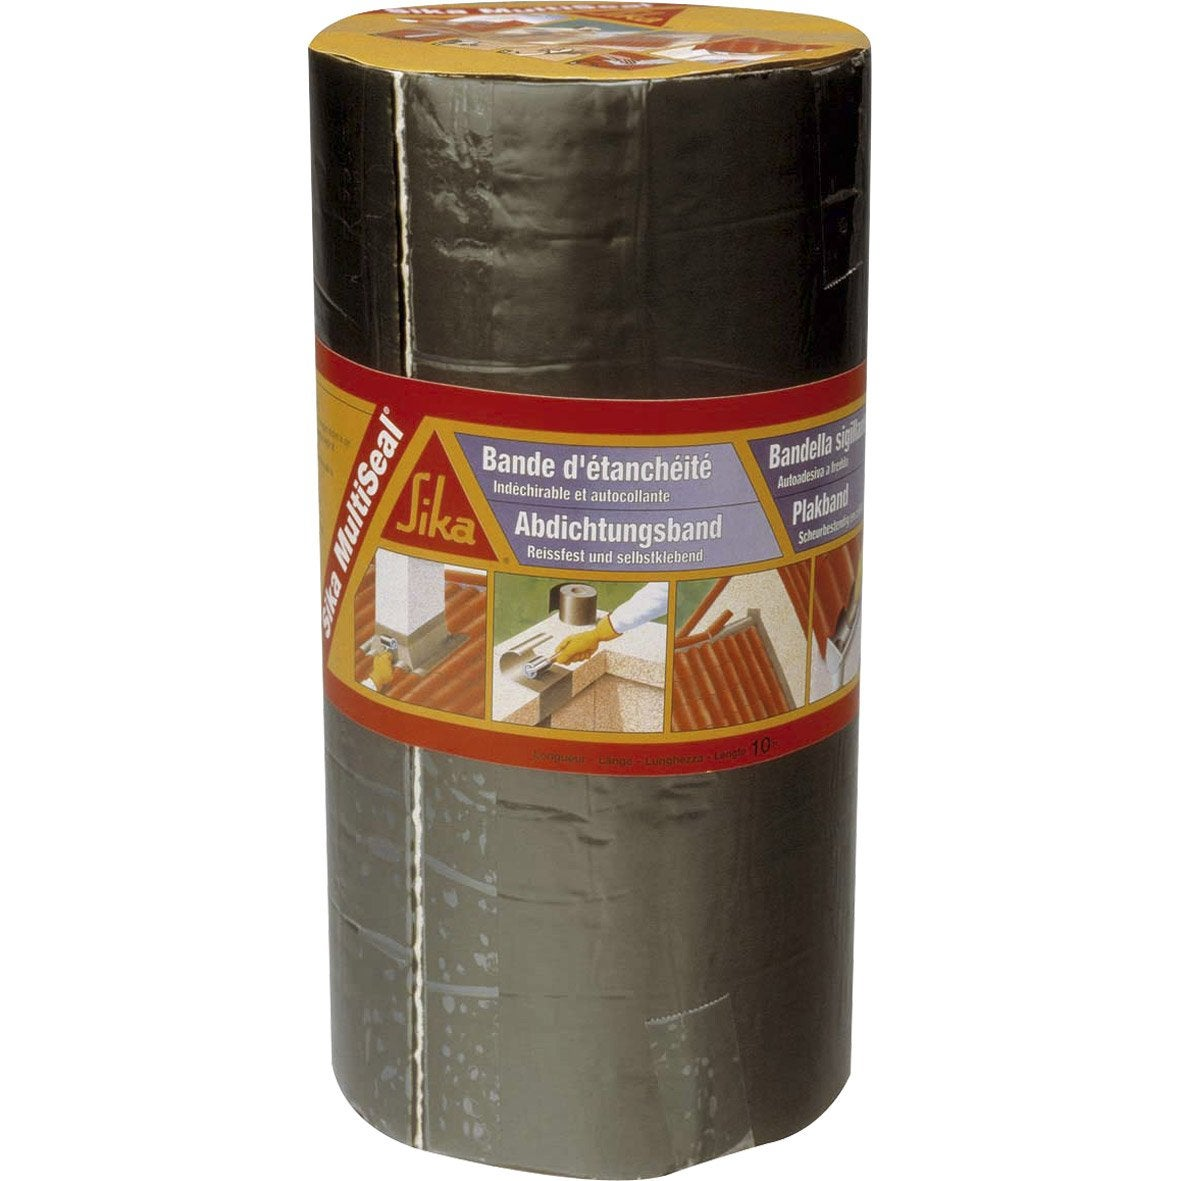 Bande adh sive d 39 tanch it sika multiseal x l 0 3 m 1155 g m leroy merlin - Croisillon autonivelant leroy merlin ...